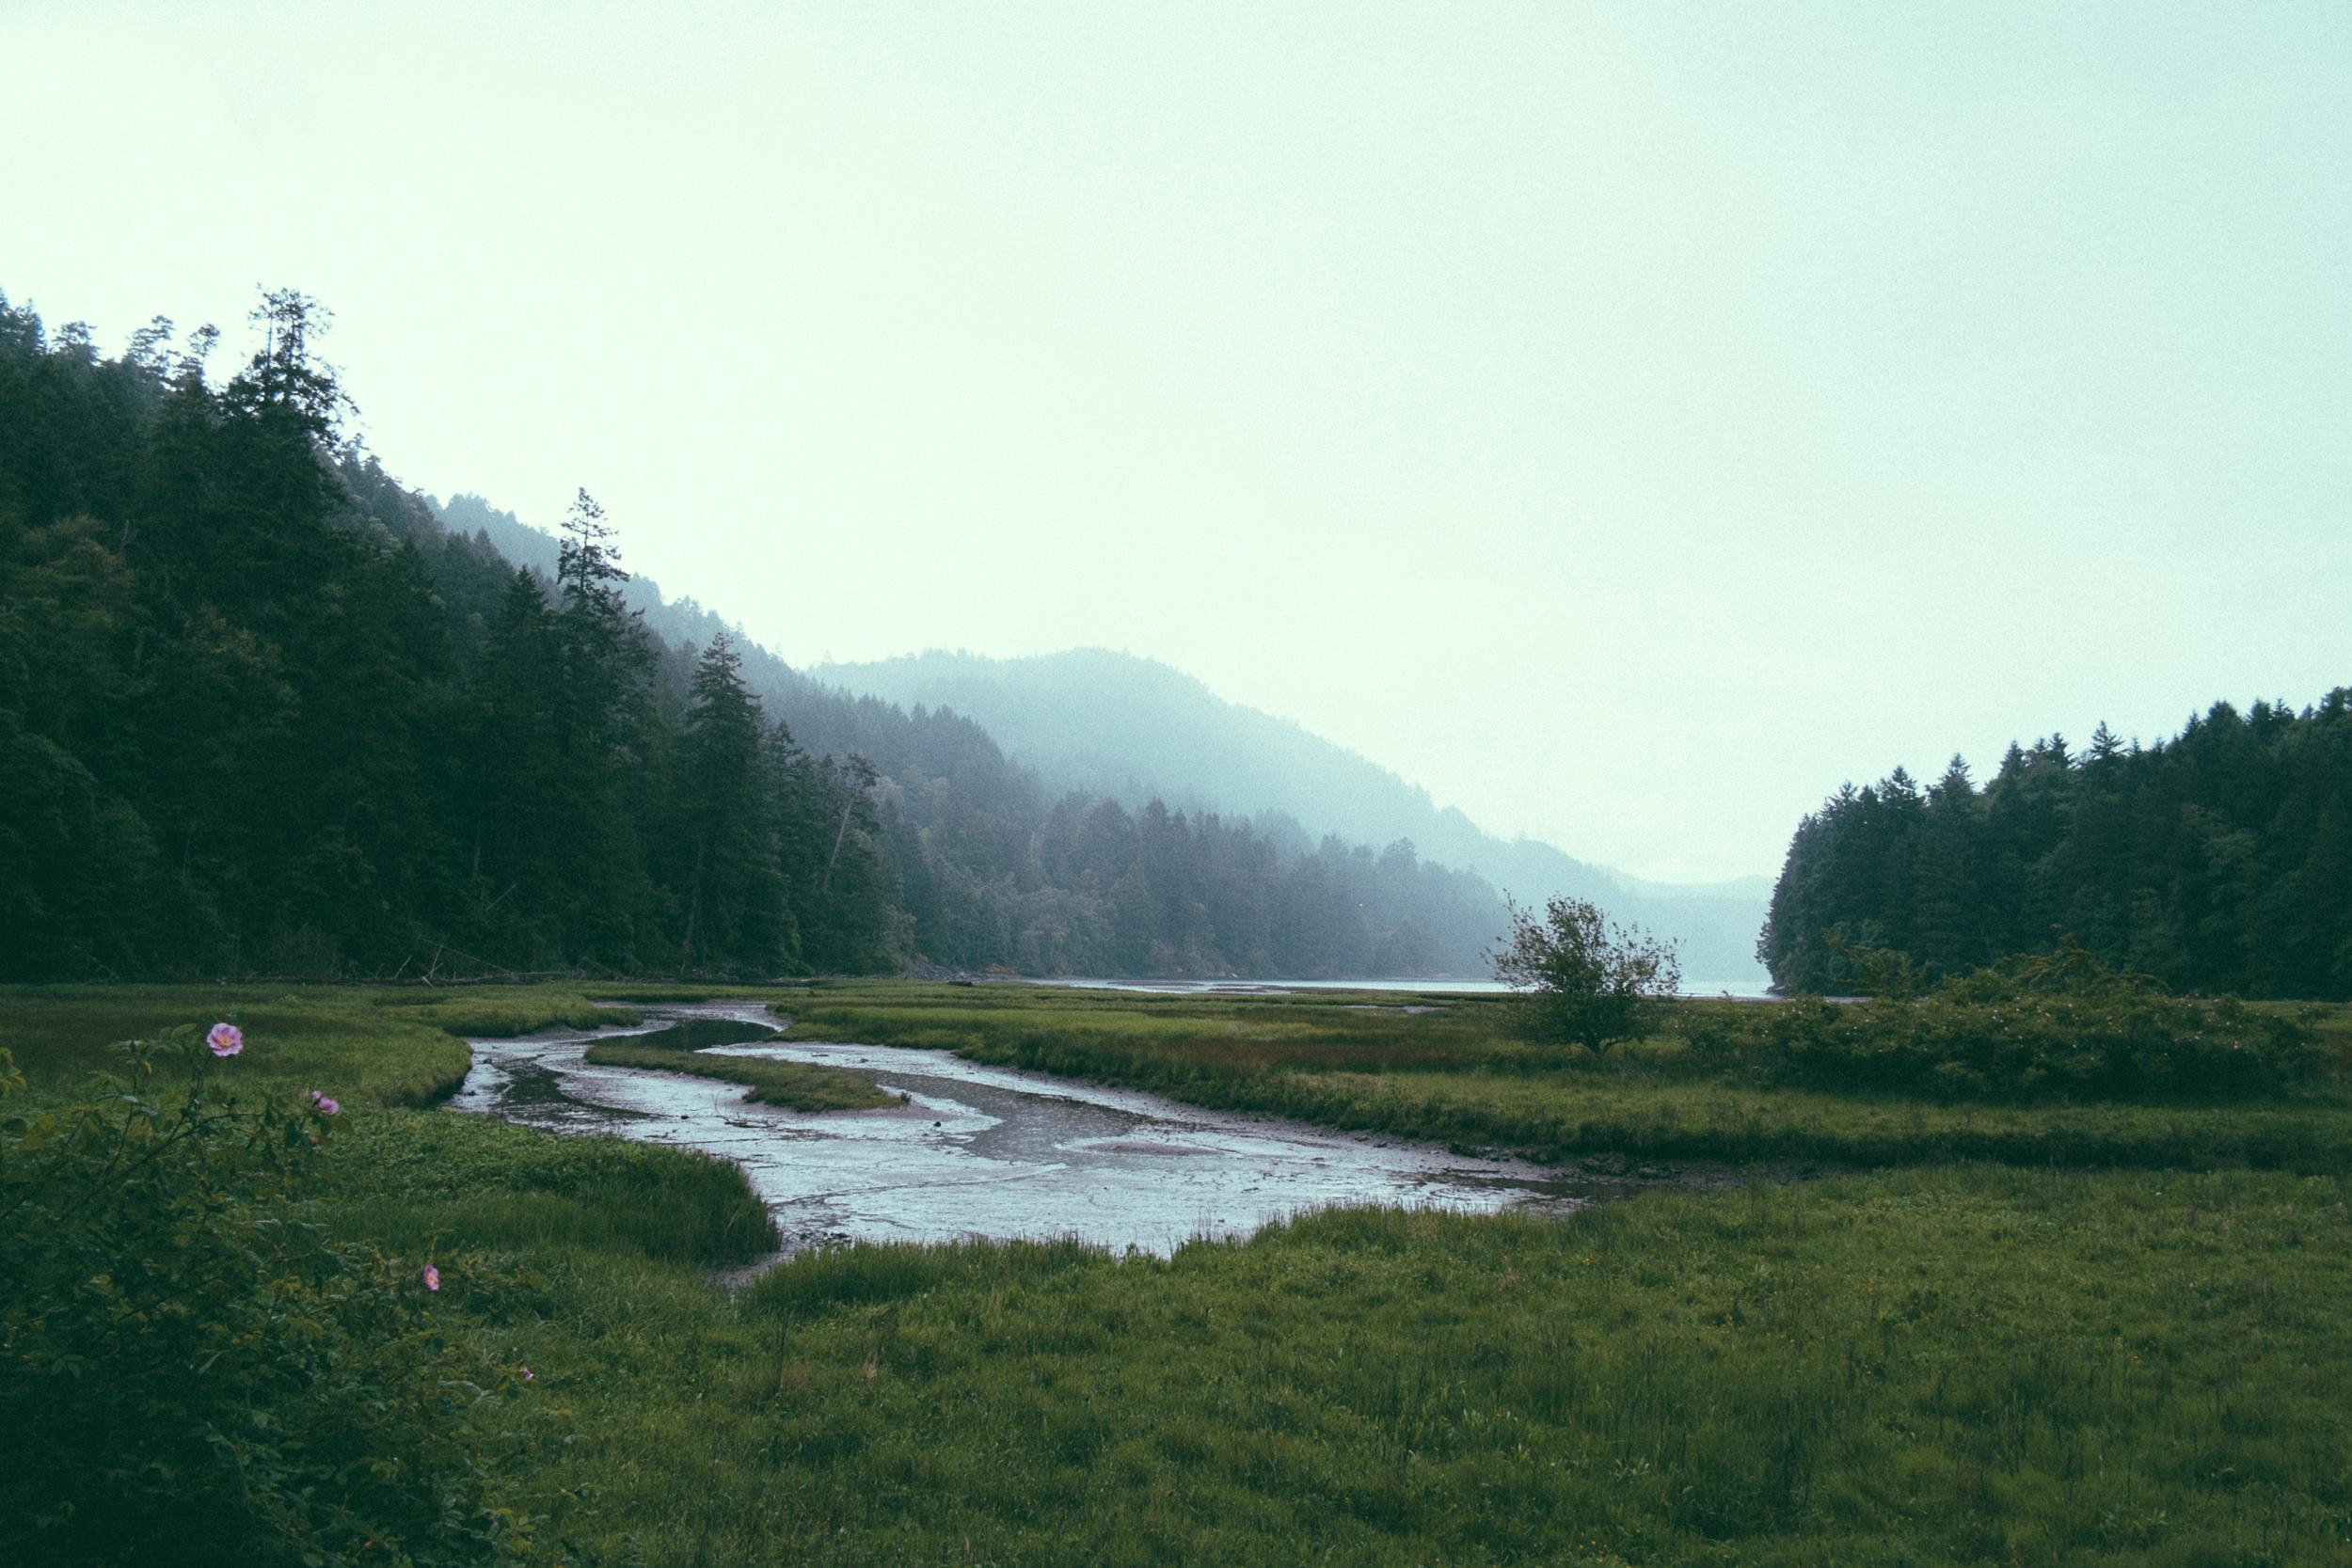 Streams & Wetlands - Magnolia restores streams and wetlands as turn-key projects or as mitigation banks.